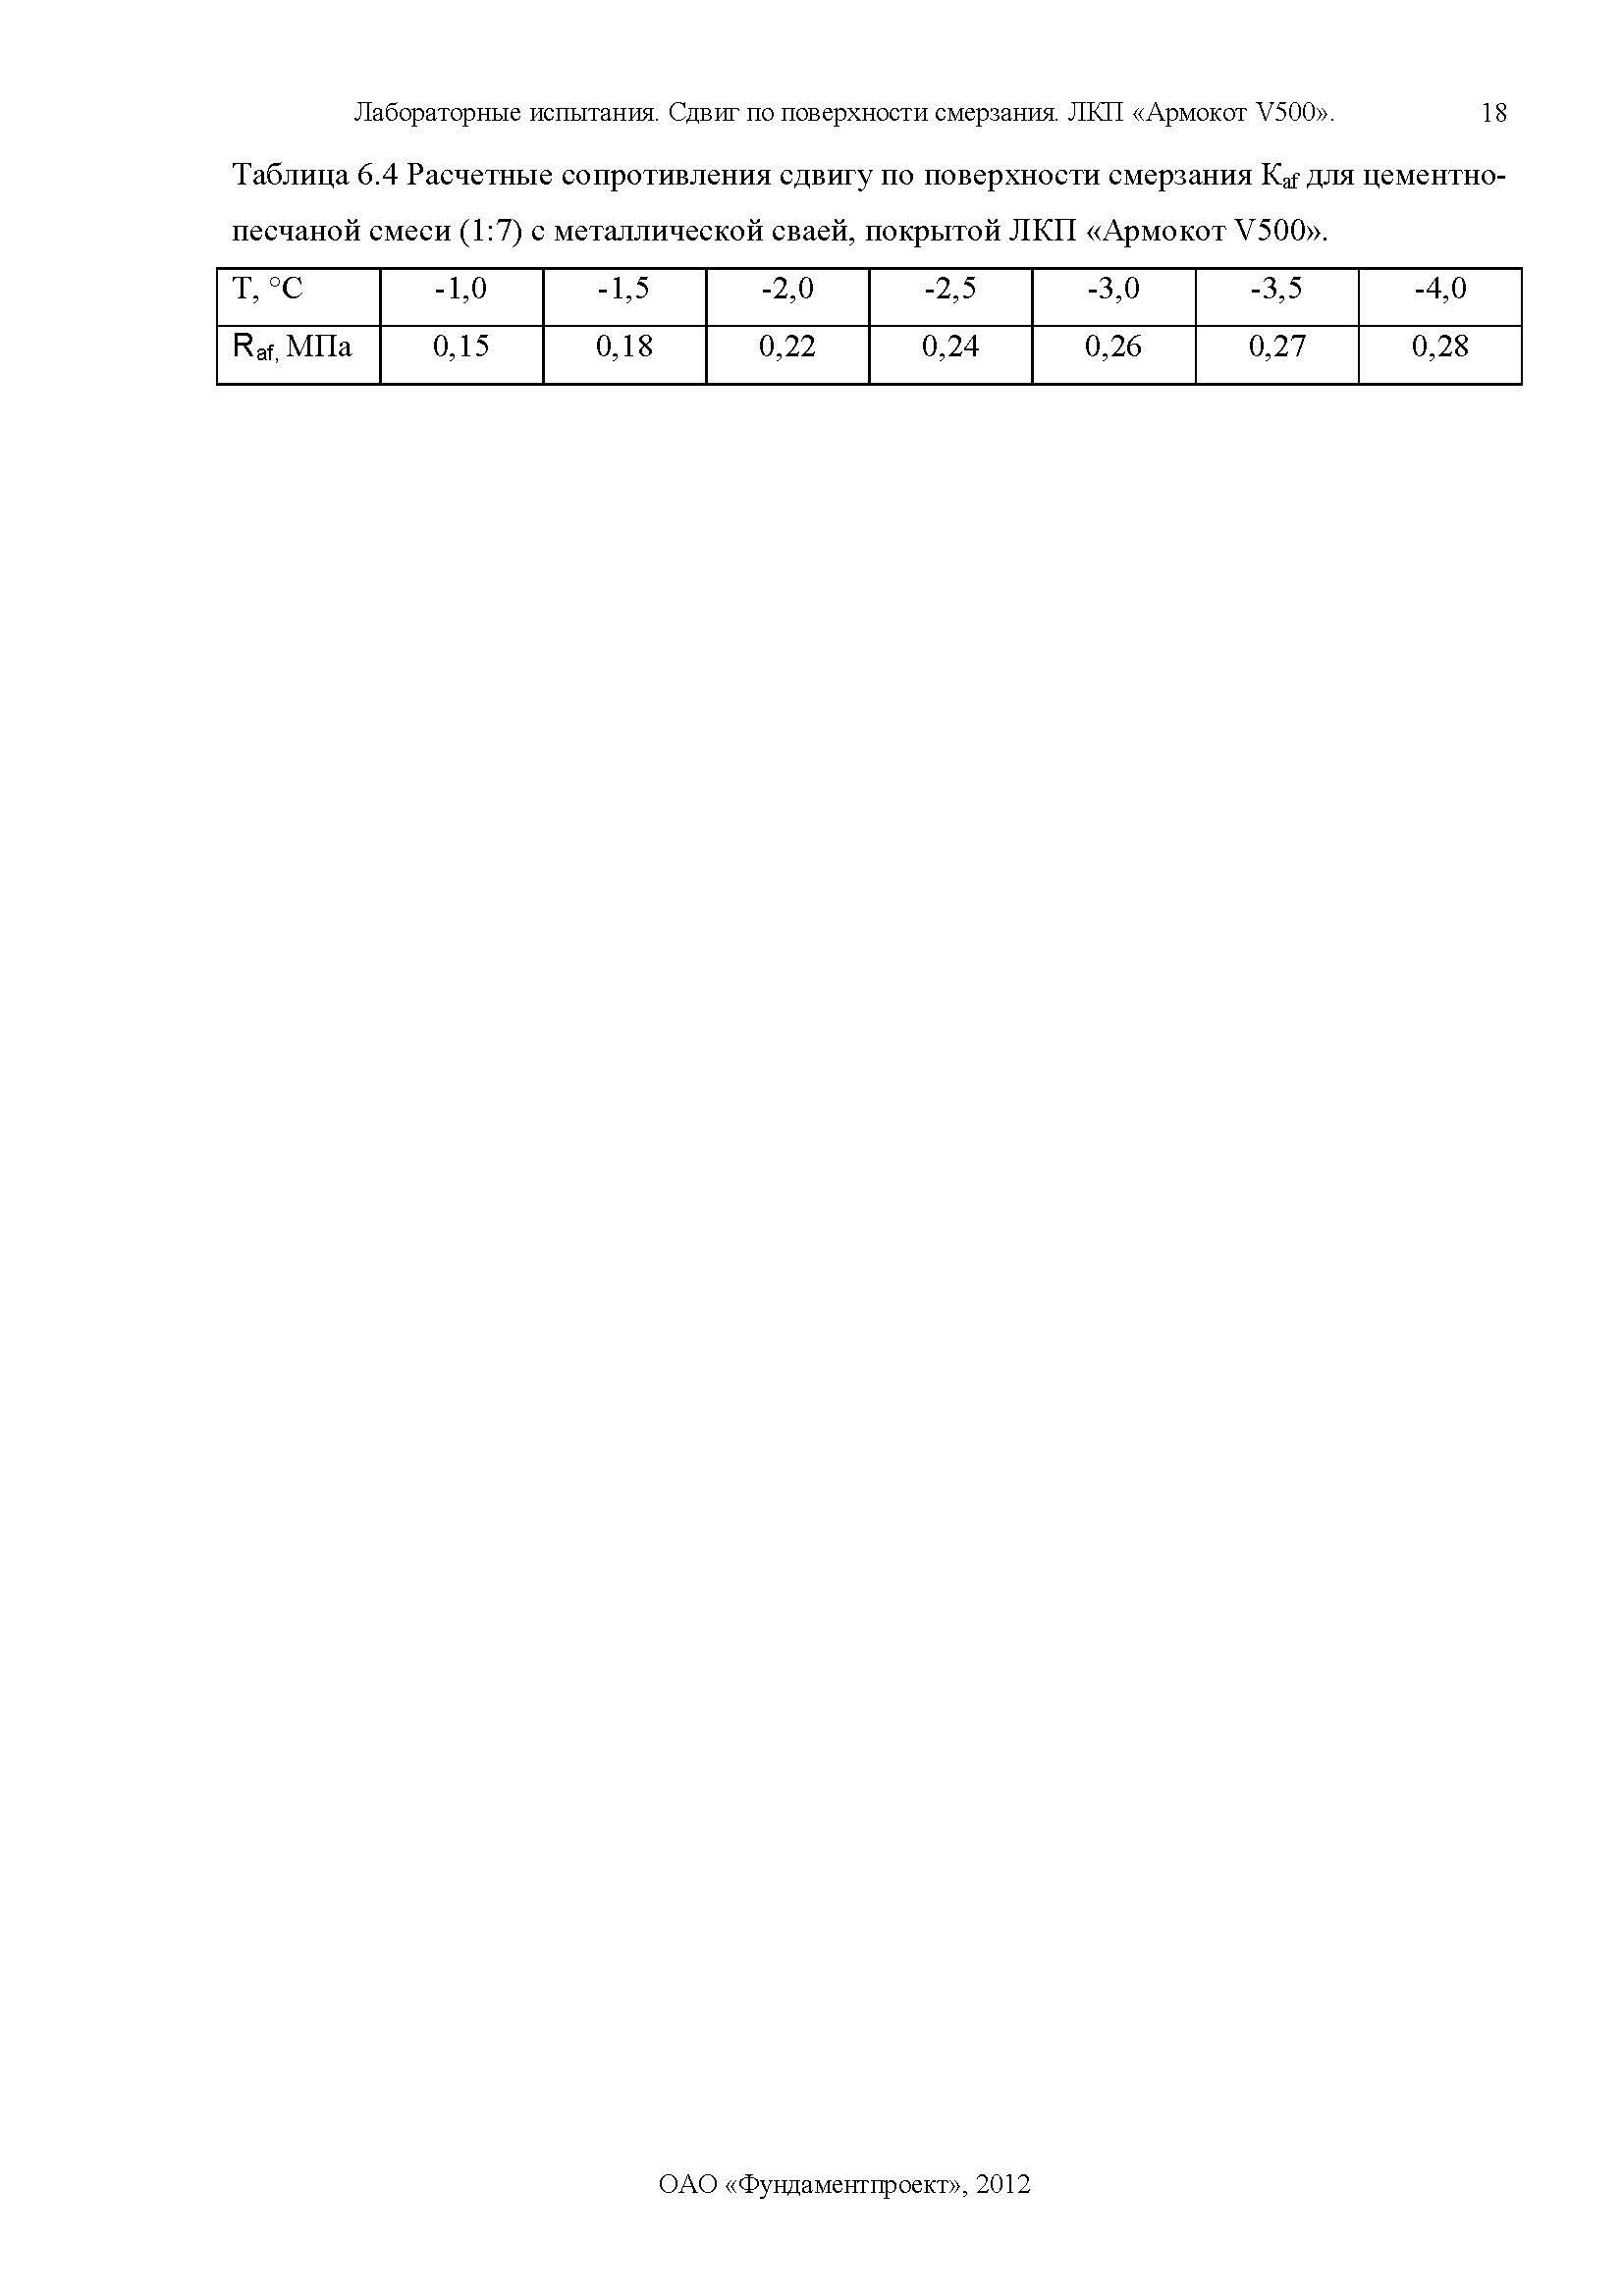 Отчет по сваям Армокот V500 Фундаментпроект_Страница_18